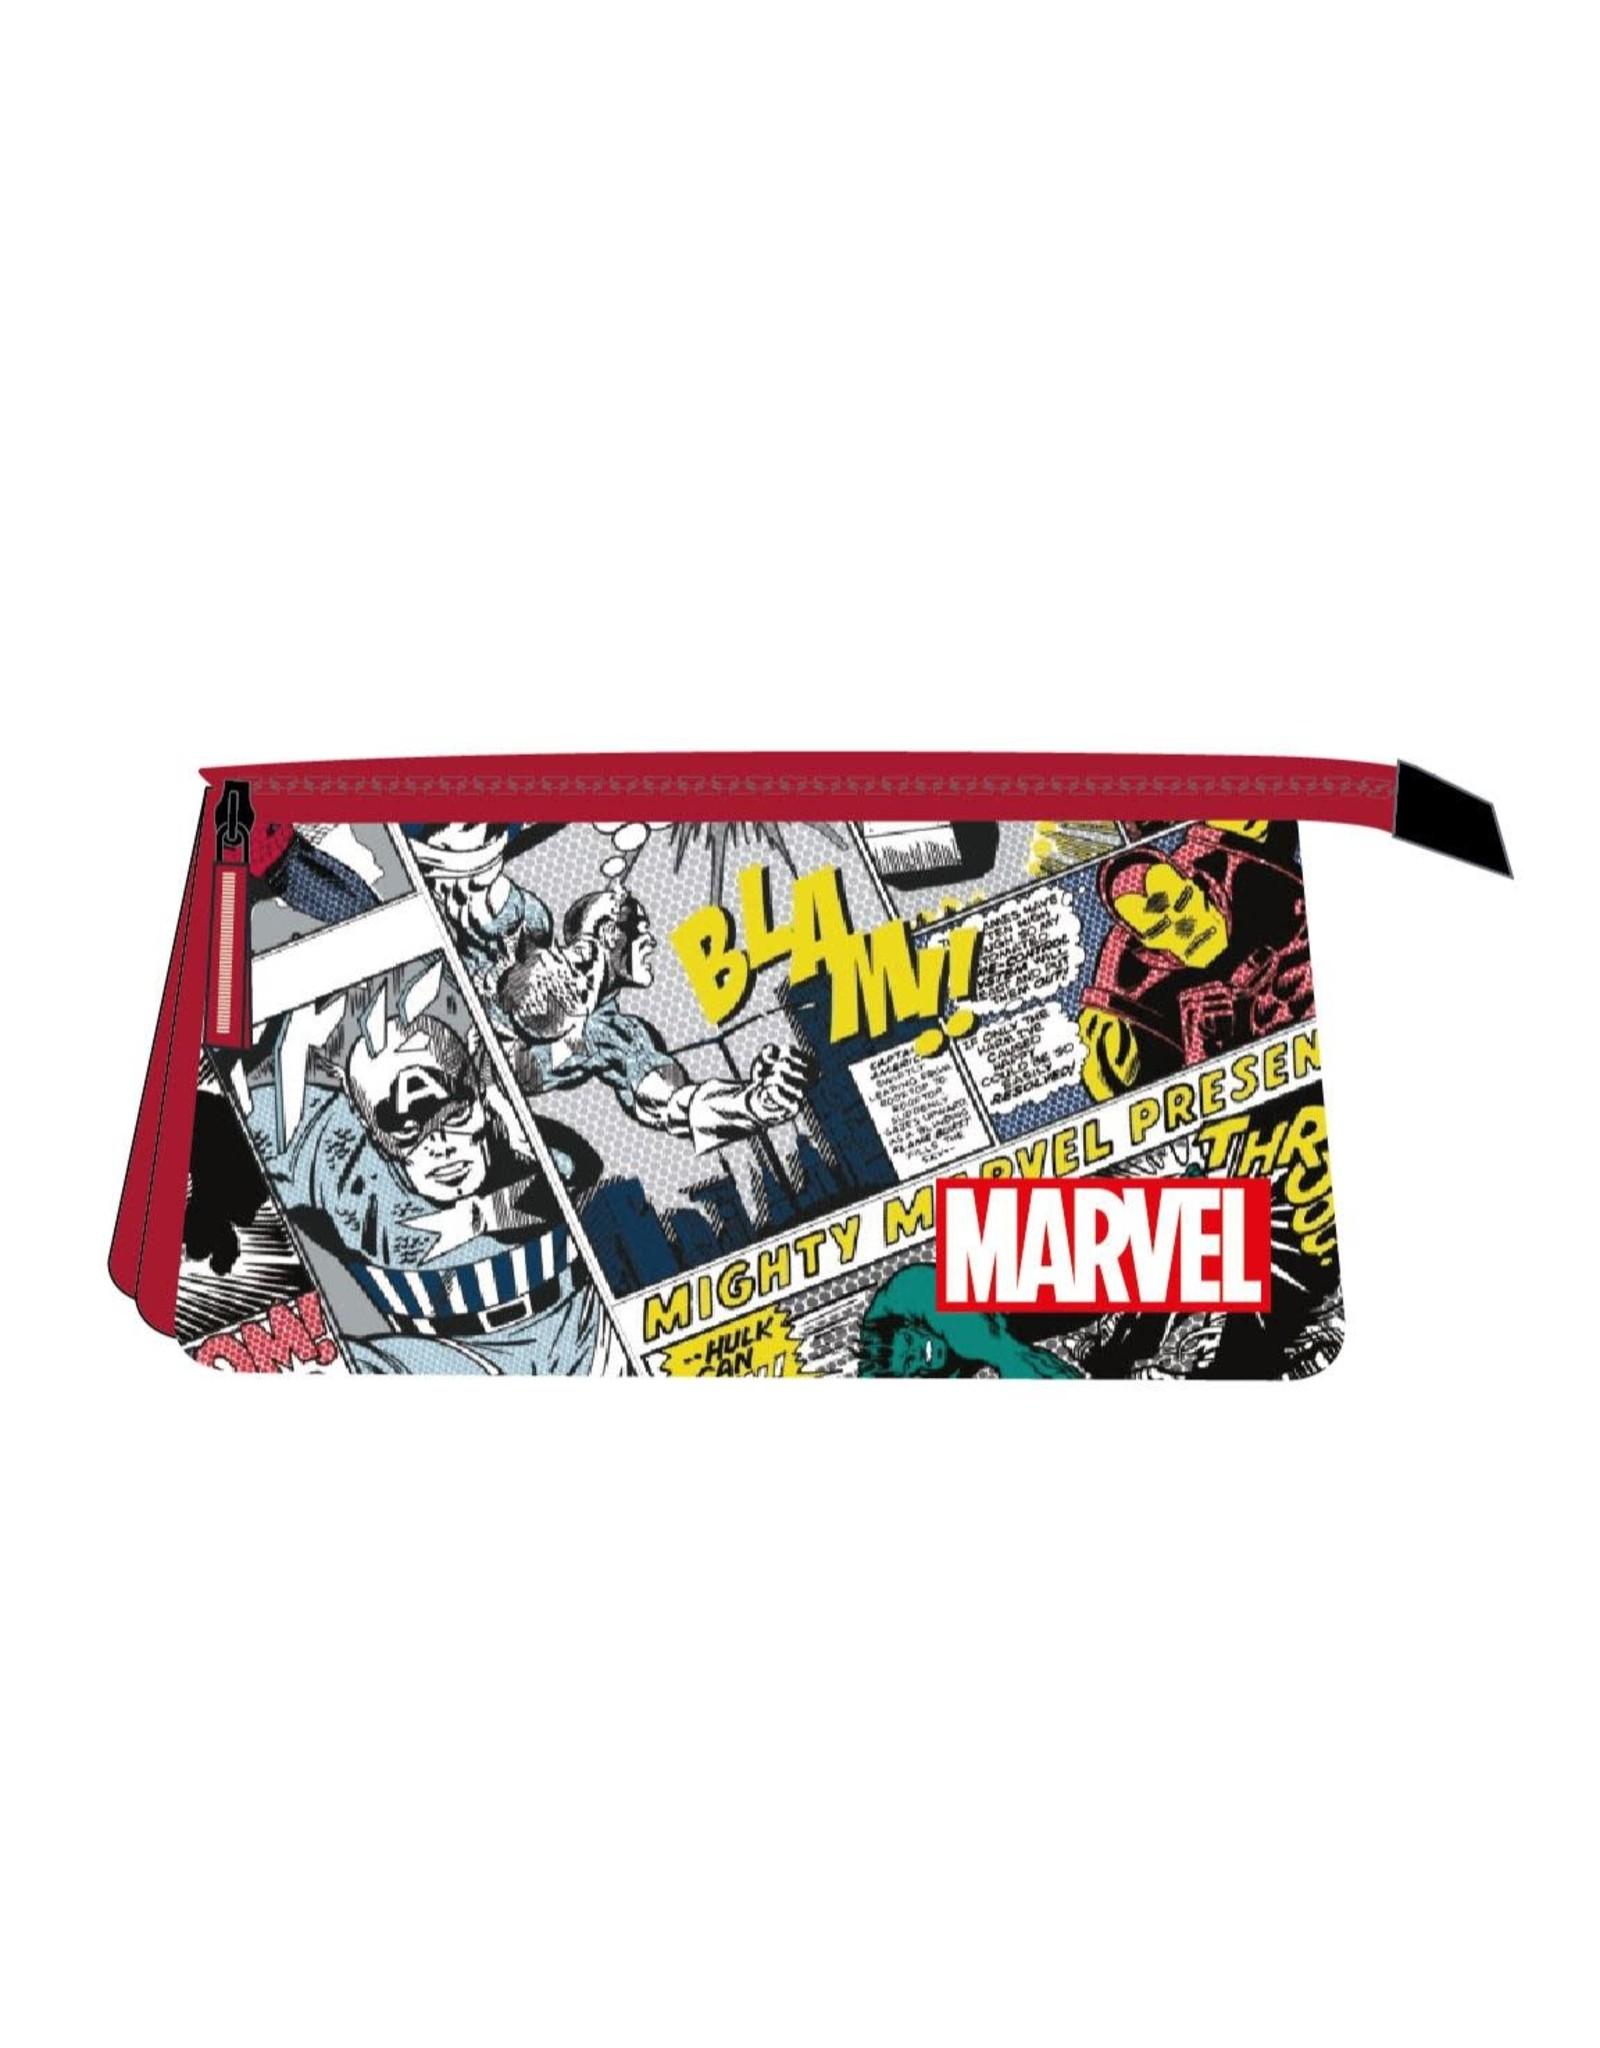 MARVEL - 3 Zippers Pencil Case